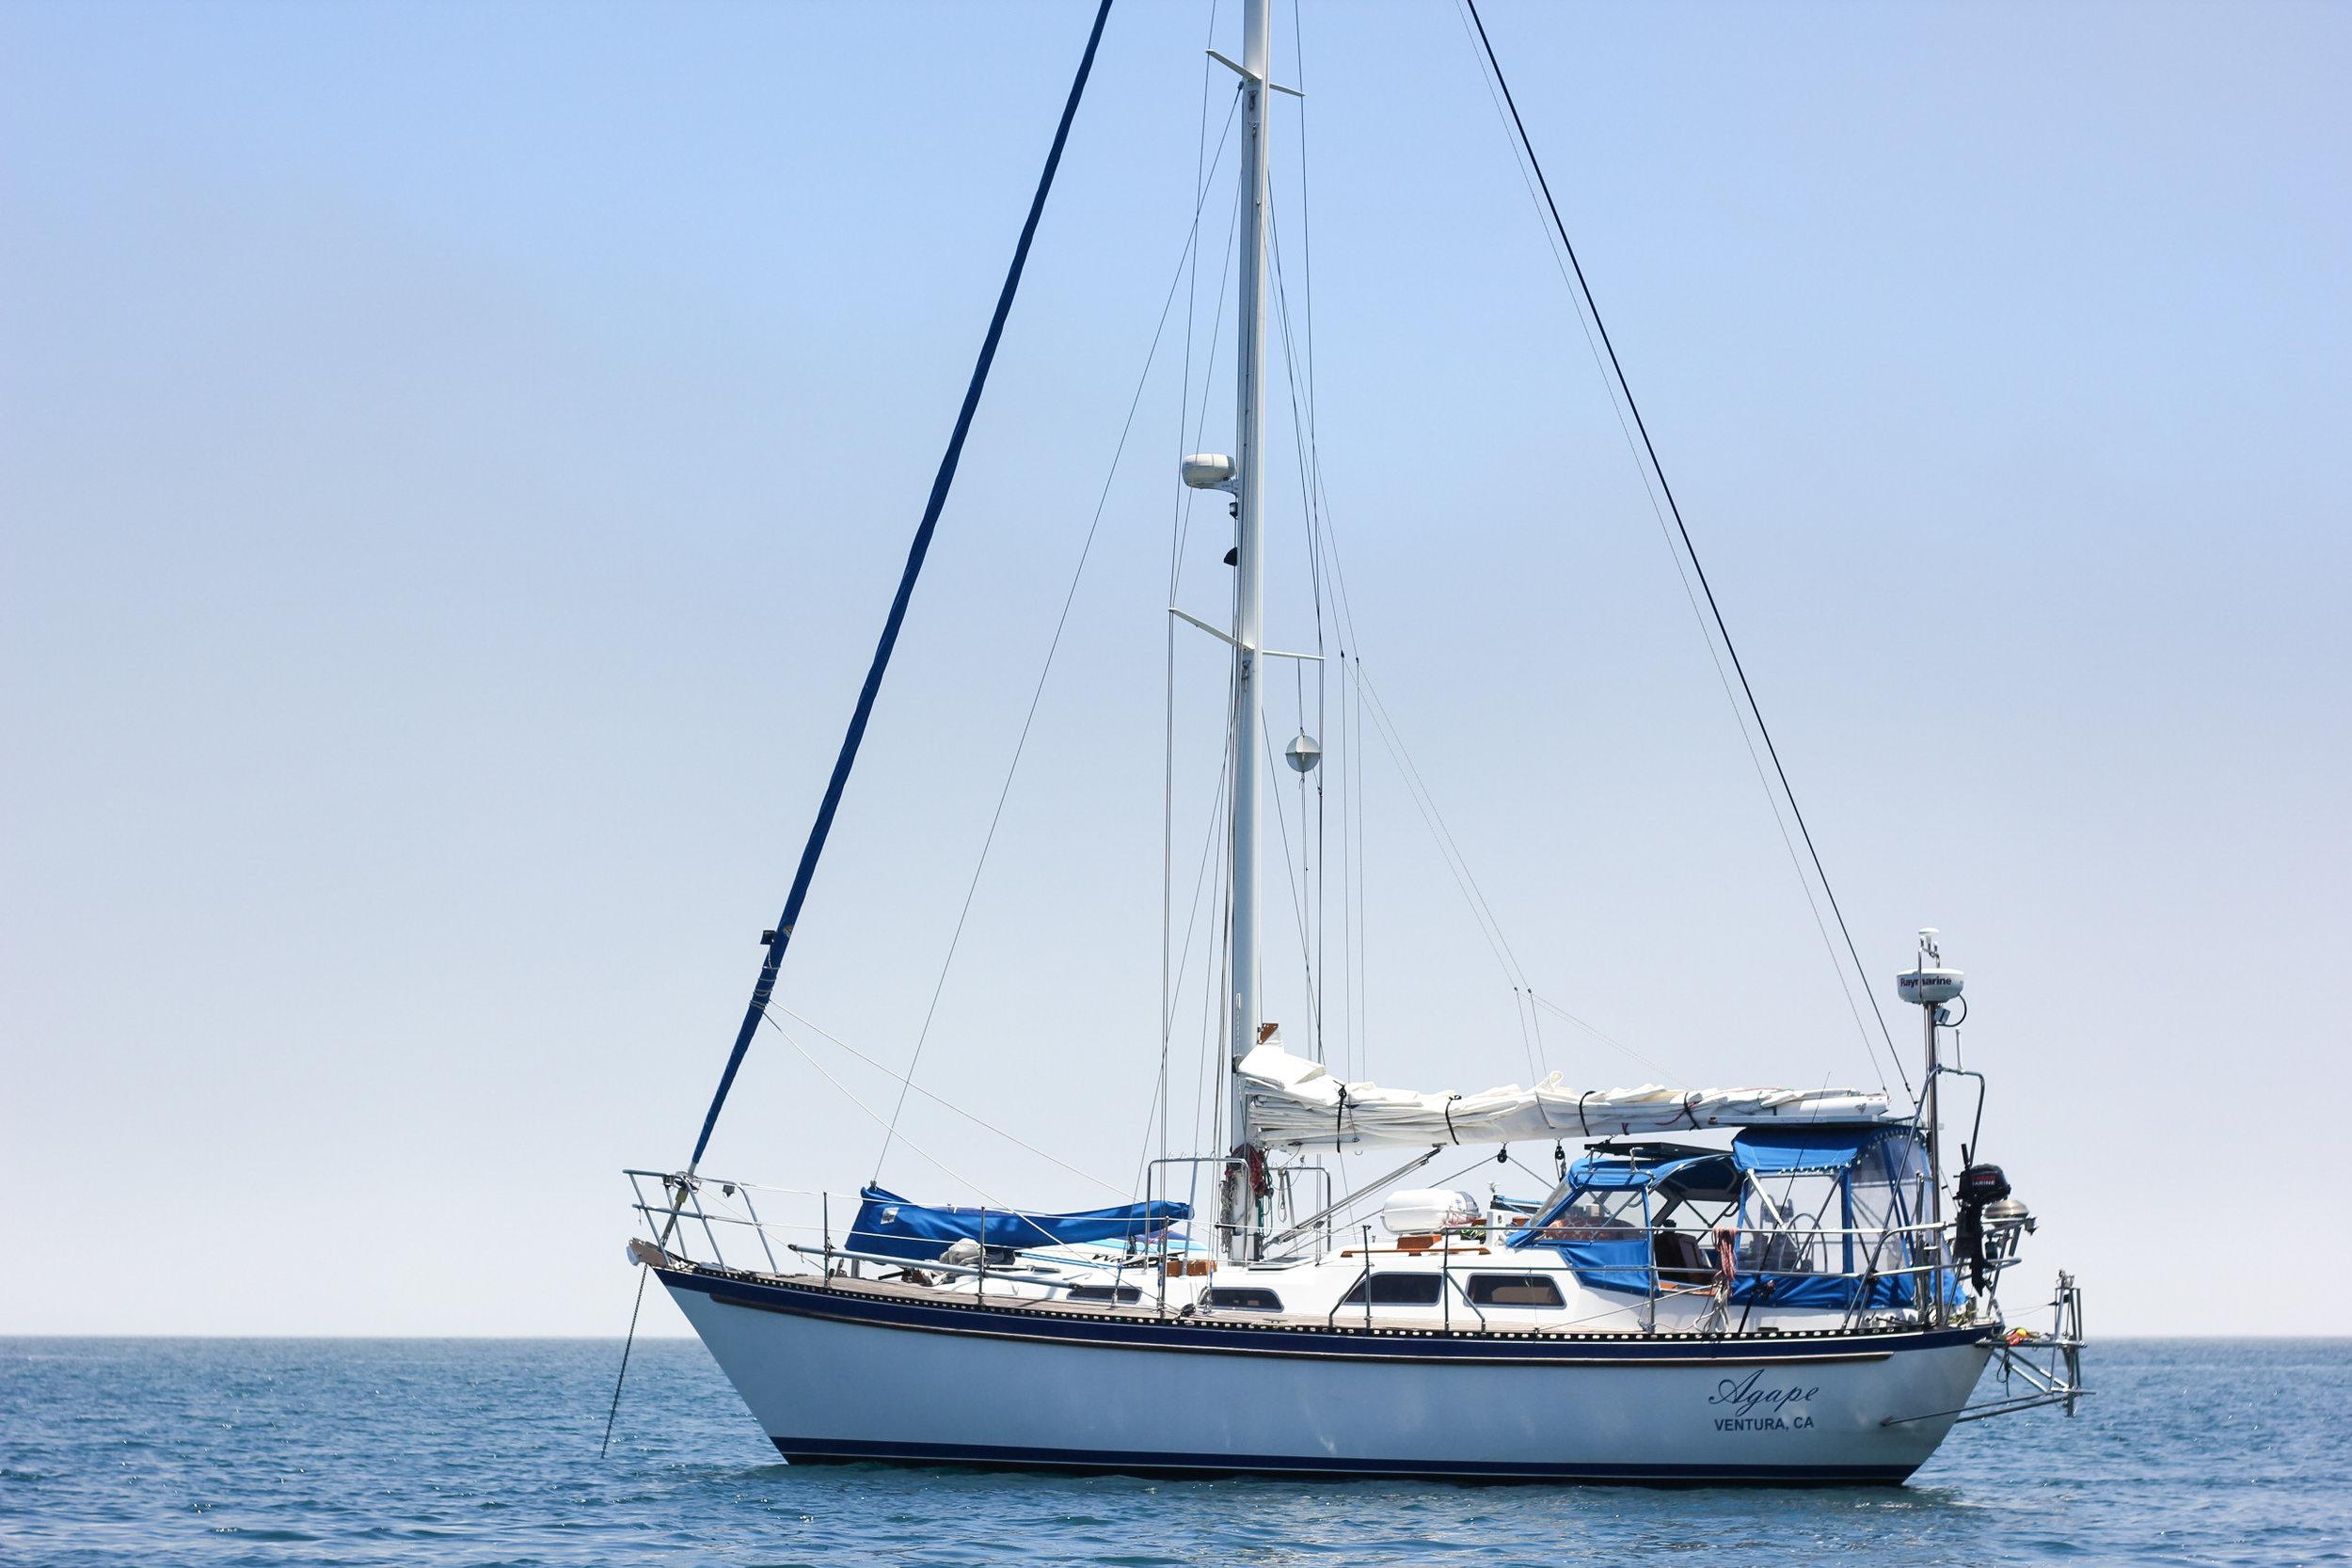 Agape anchored in Scorpion.